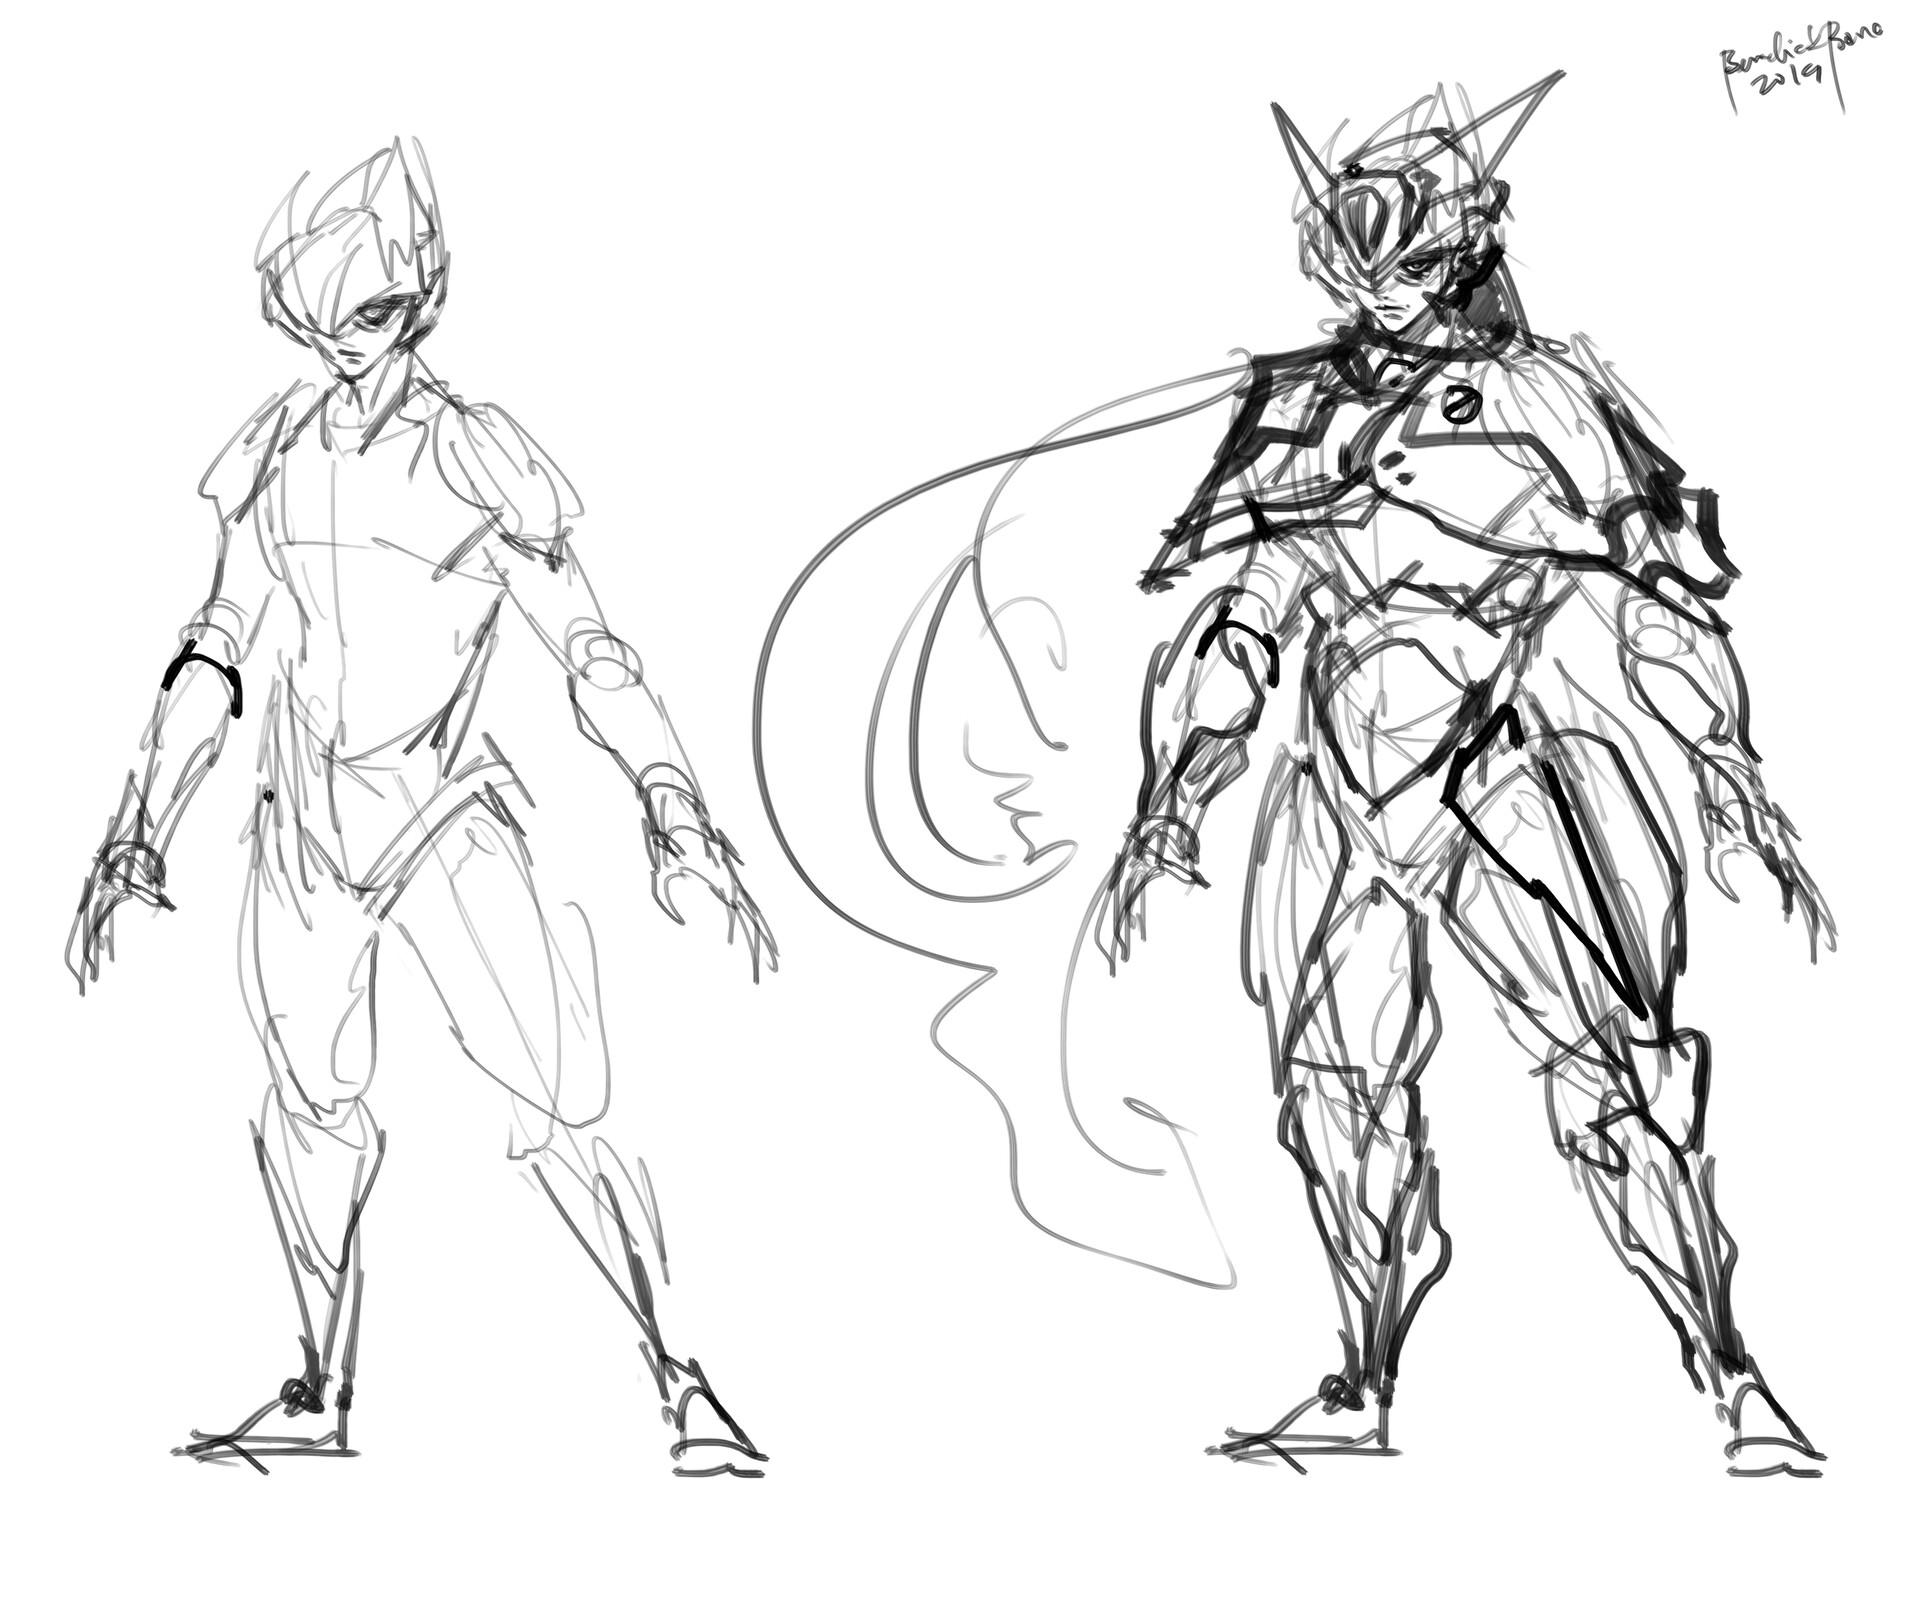 Quick Sketch character design BLOODLUST